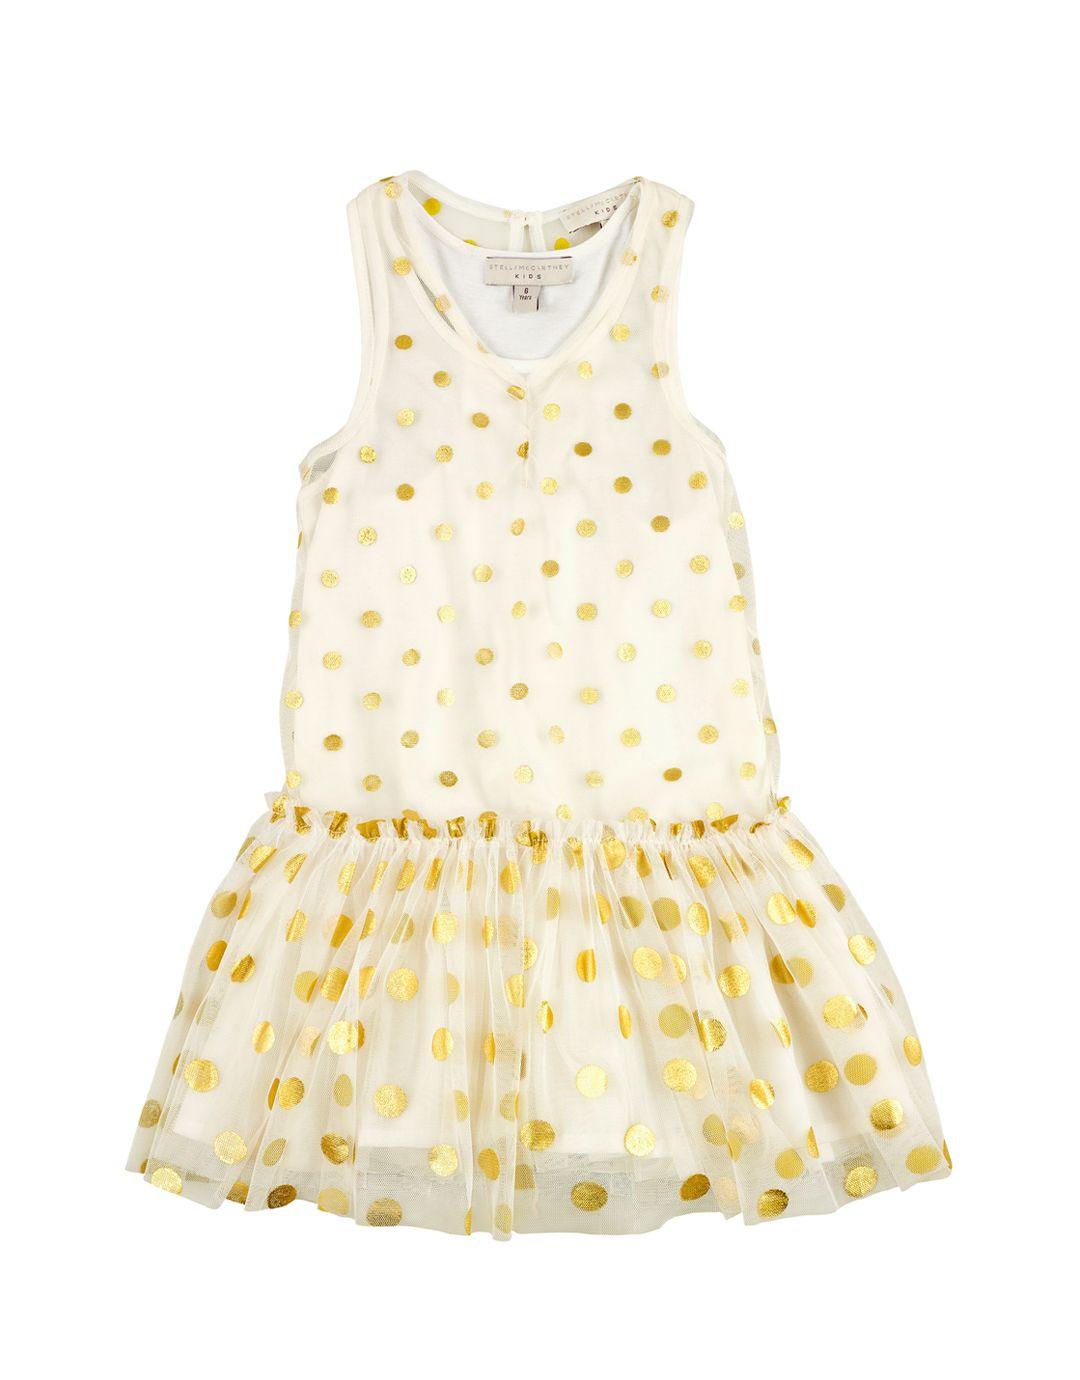 STELLA McCARTNEY KIDS  Gold Collection Polka Dot Layer Dress